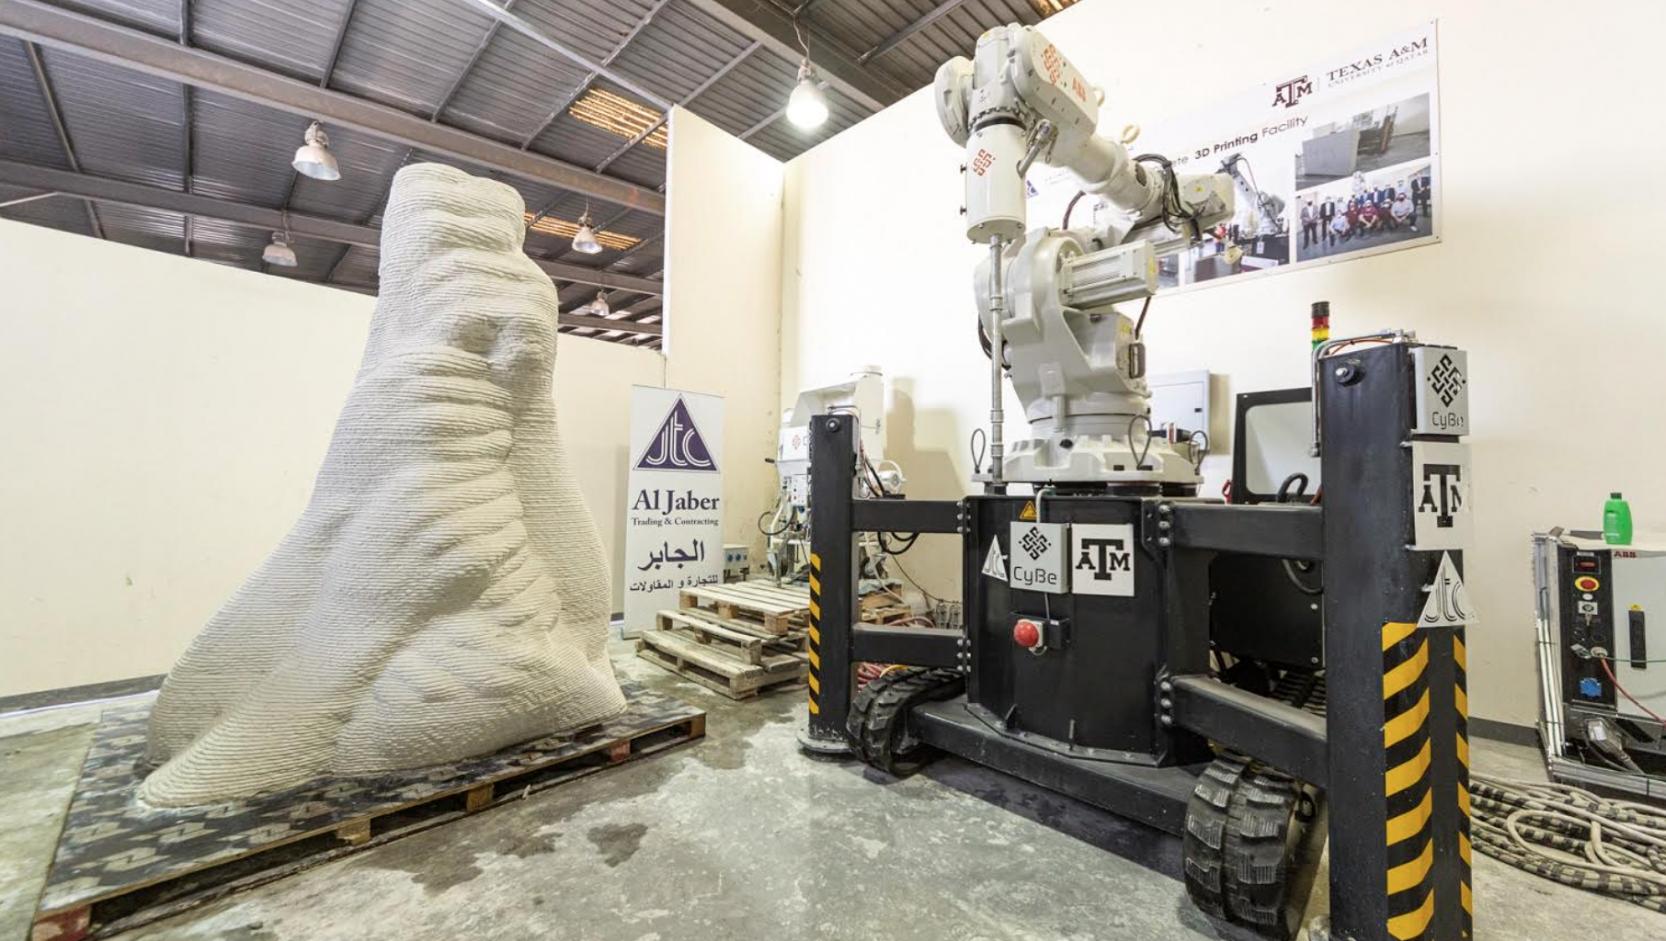 Qatar's first concrete 3D sculpture printed in a few minutes